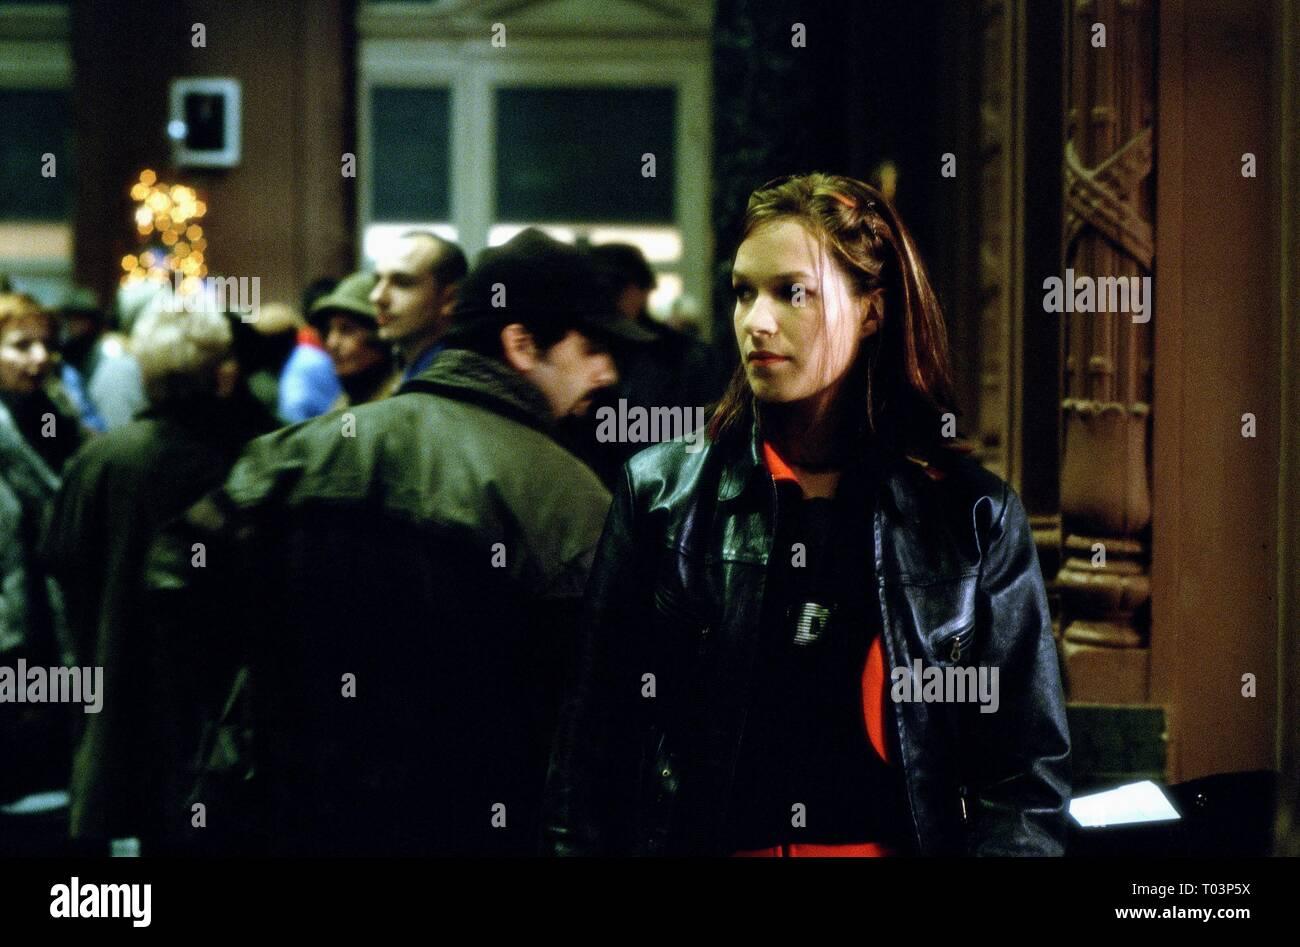 Franka Potente The Bourne Identity 2002 Stock Photo Alamy